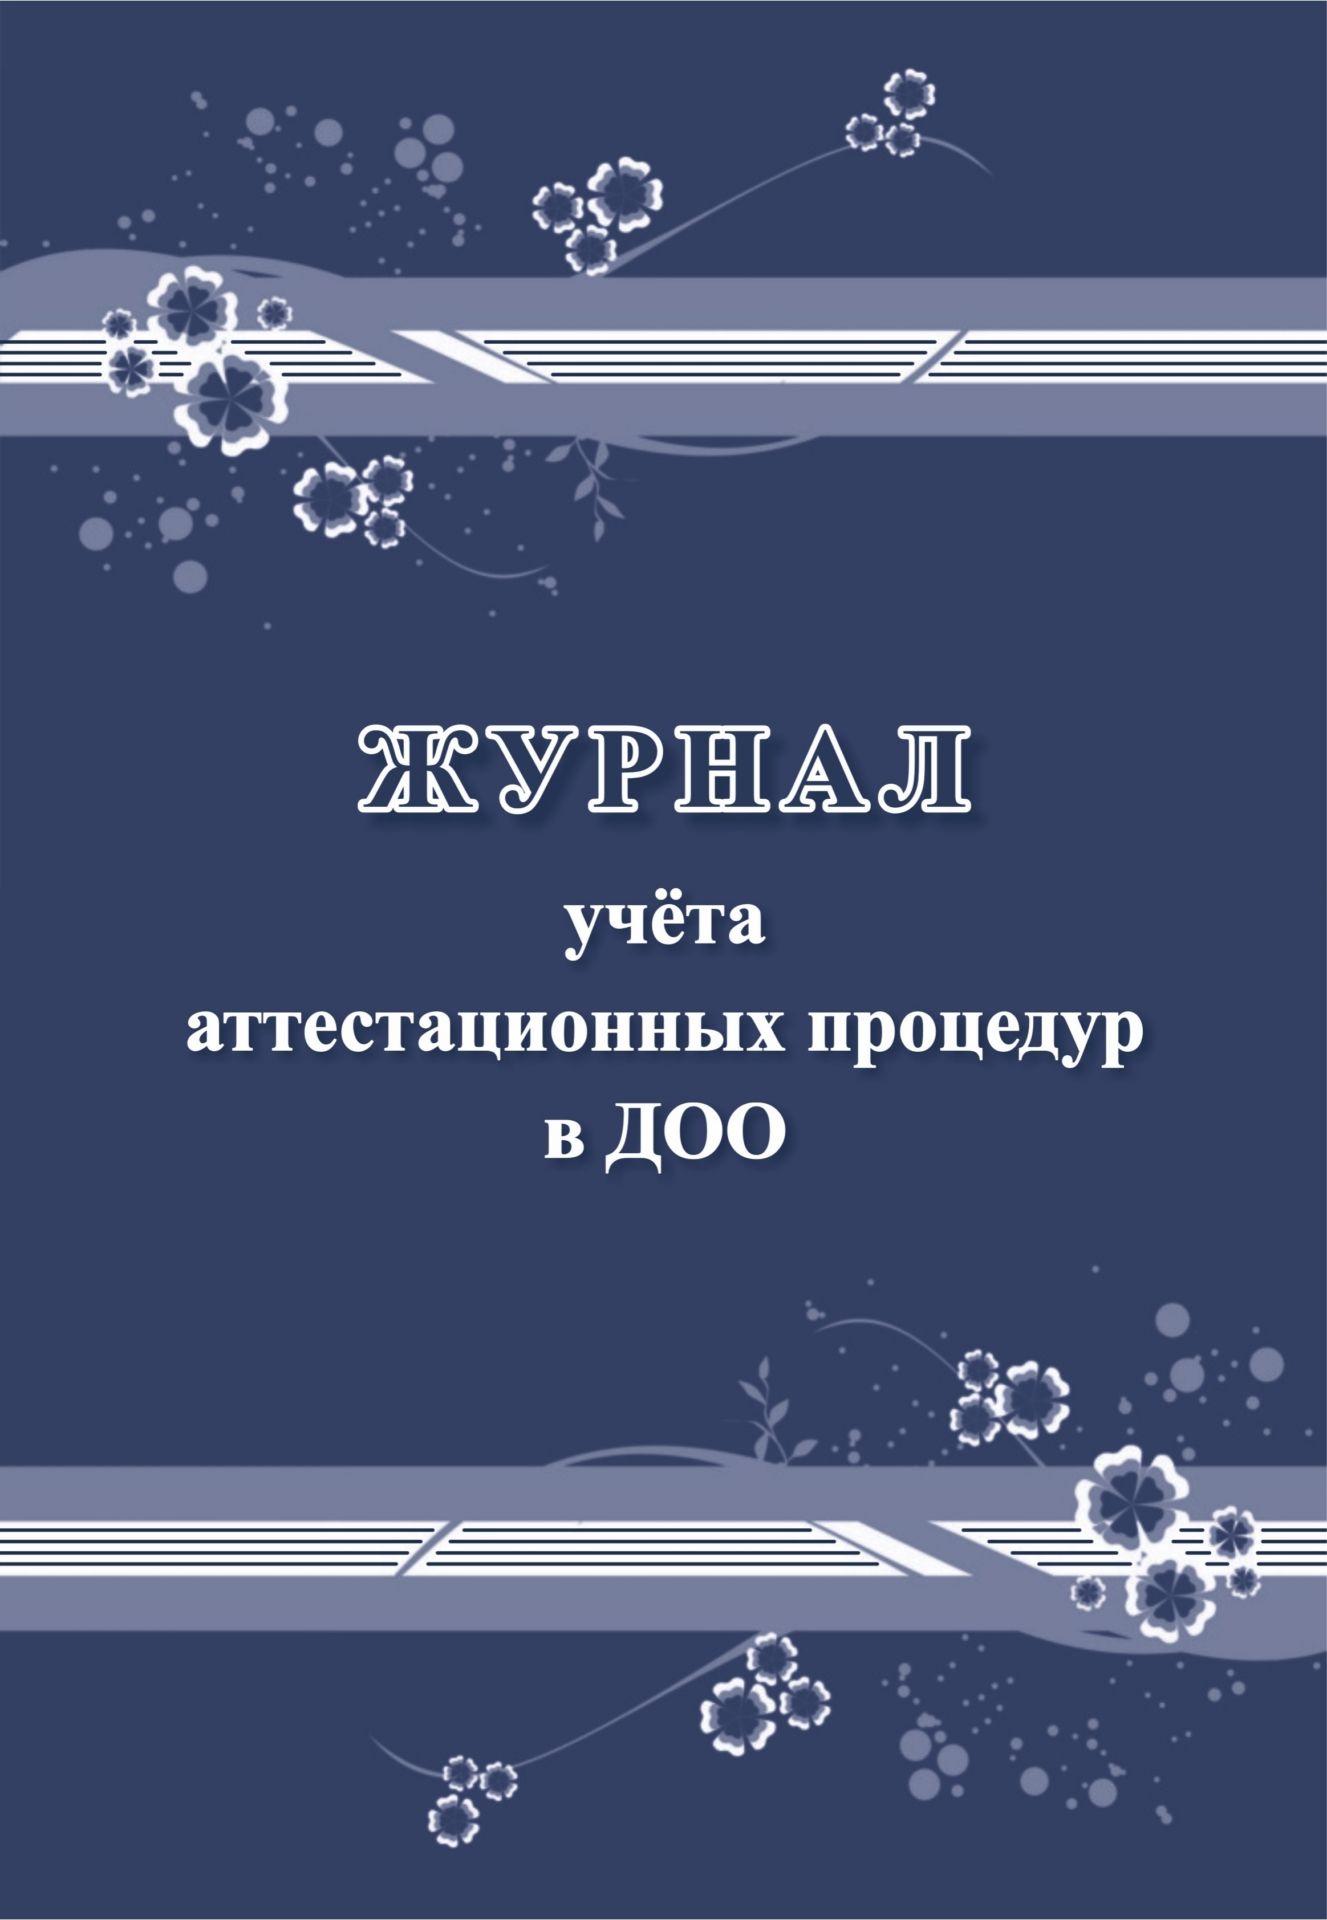 Журнал учёта аттестационных процедур в ДОО